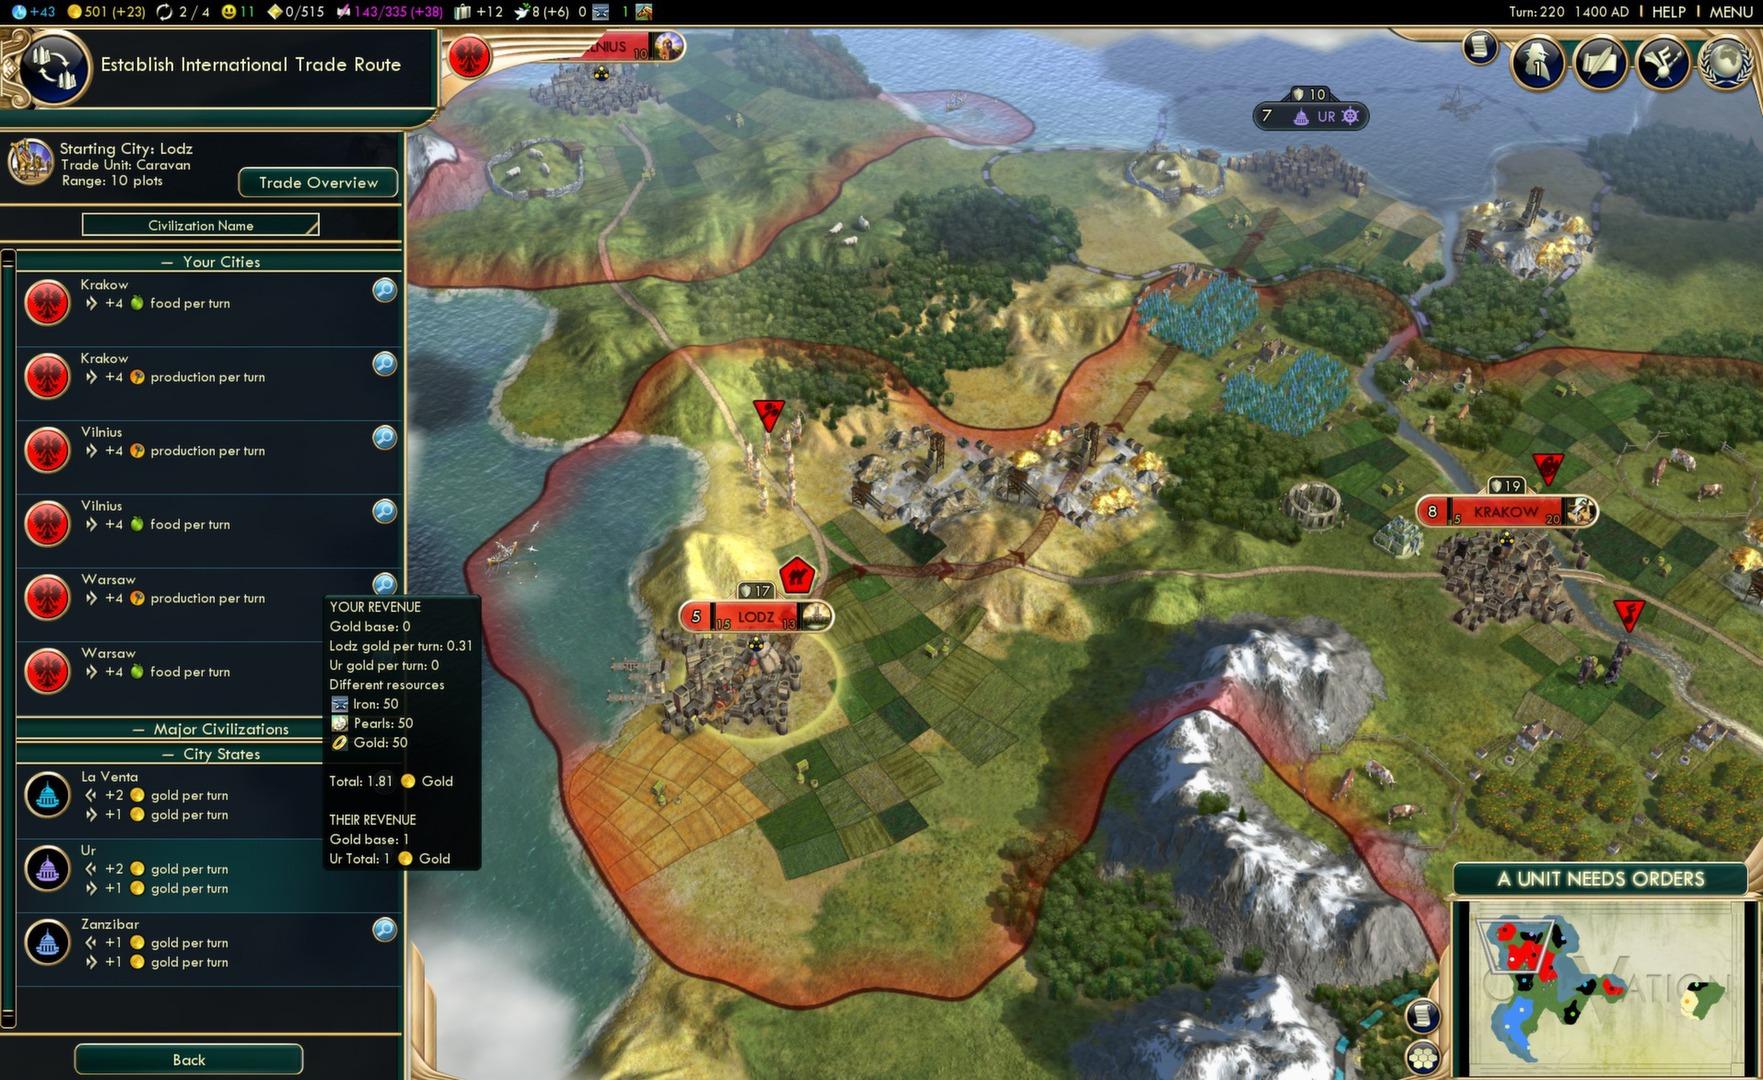 civilization 5 torrent download